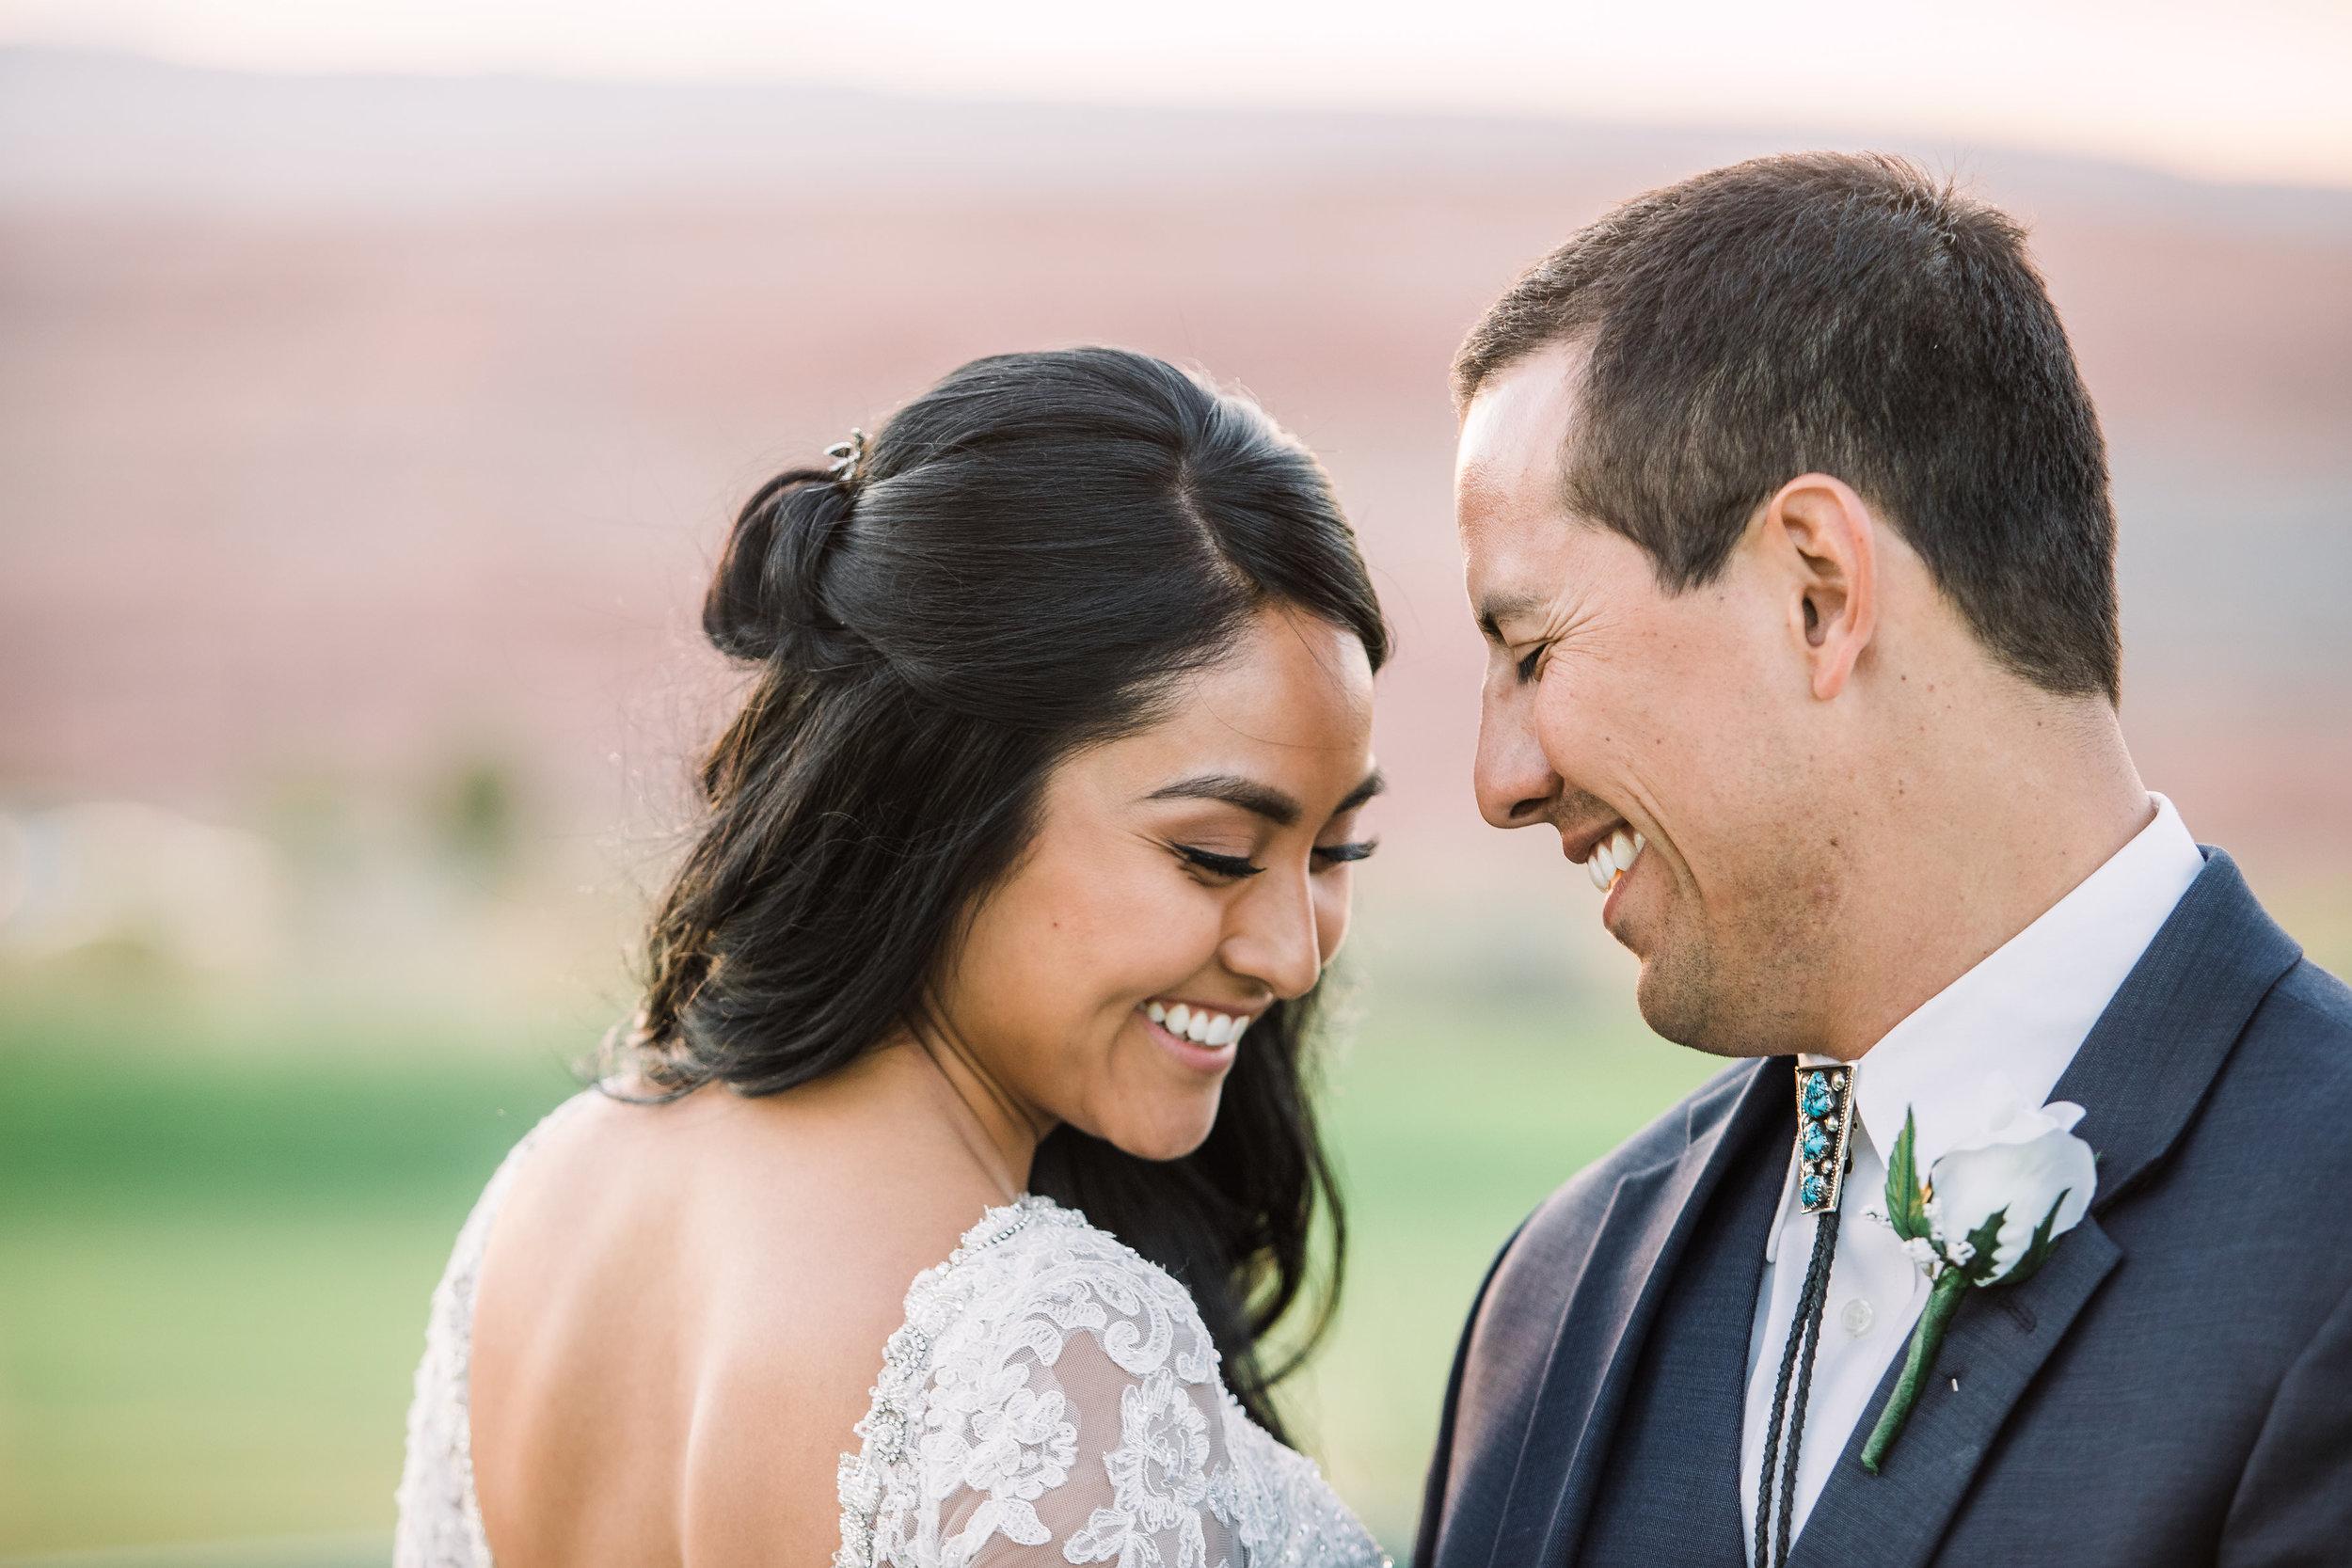 Bride Groom Wedding Smile